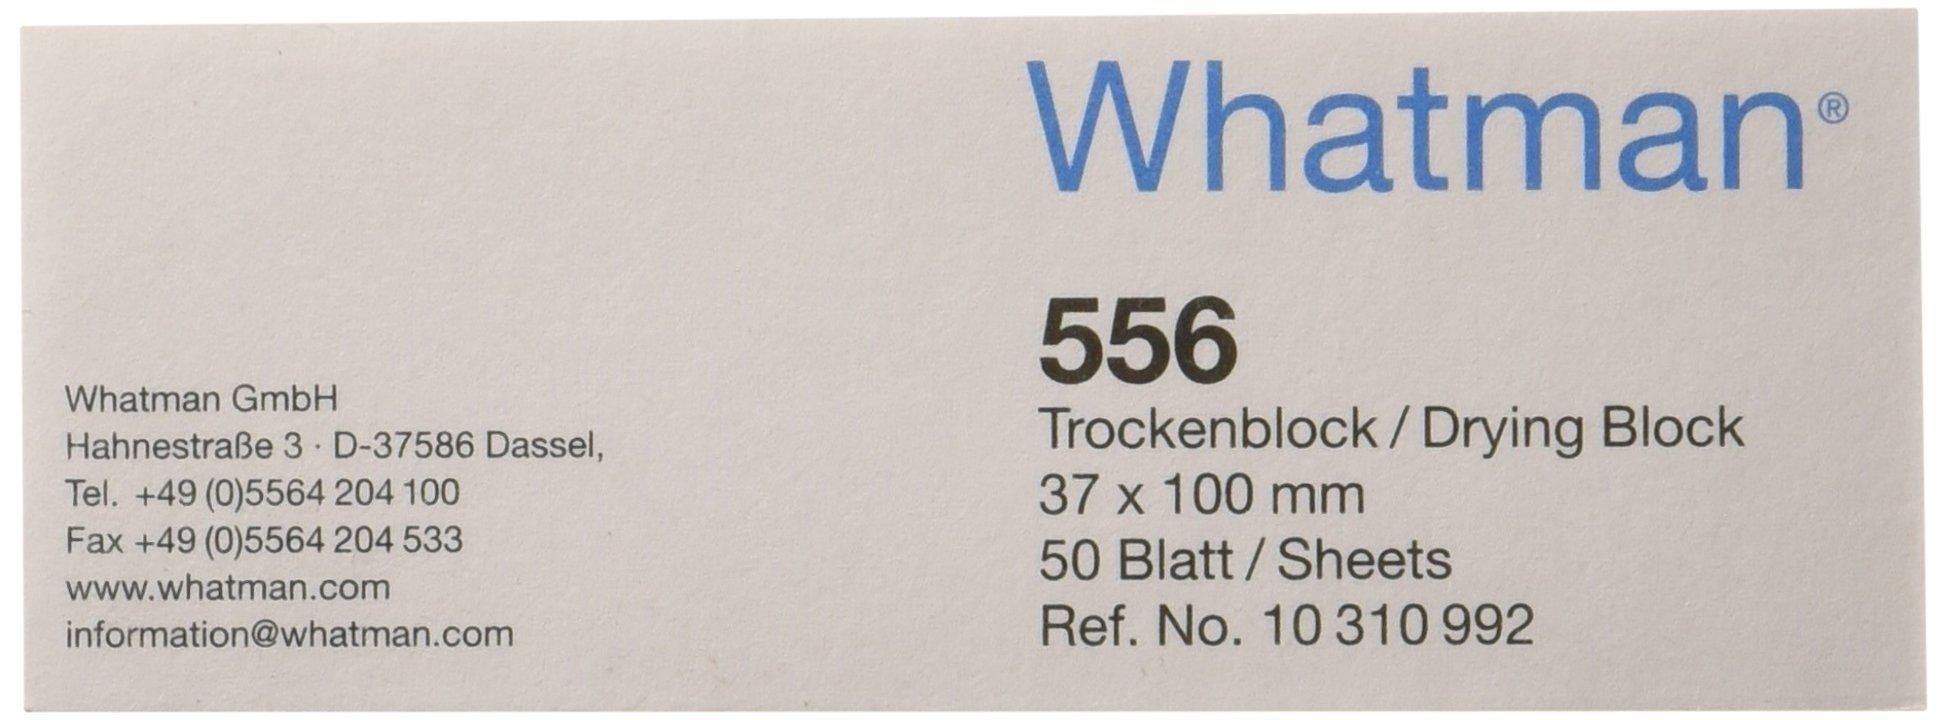 GE Whatman 10310992 Drying Pad, Grade 556, 37mm Width x 100mm Length (Pack of 100)